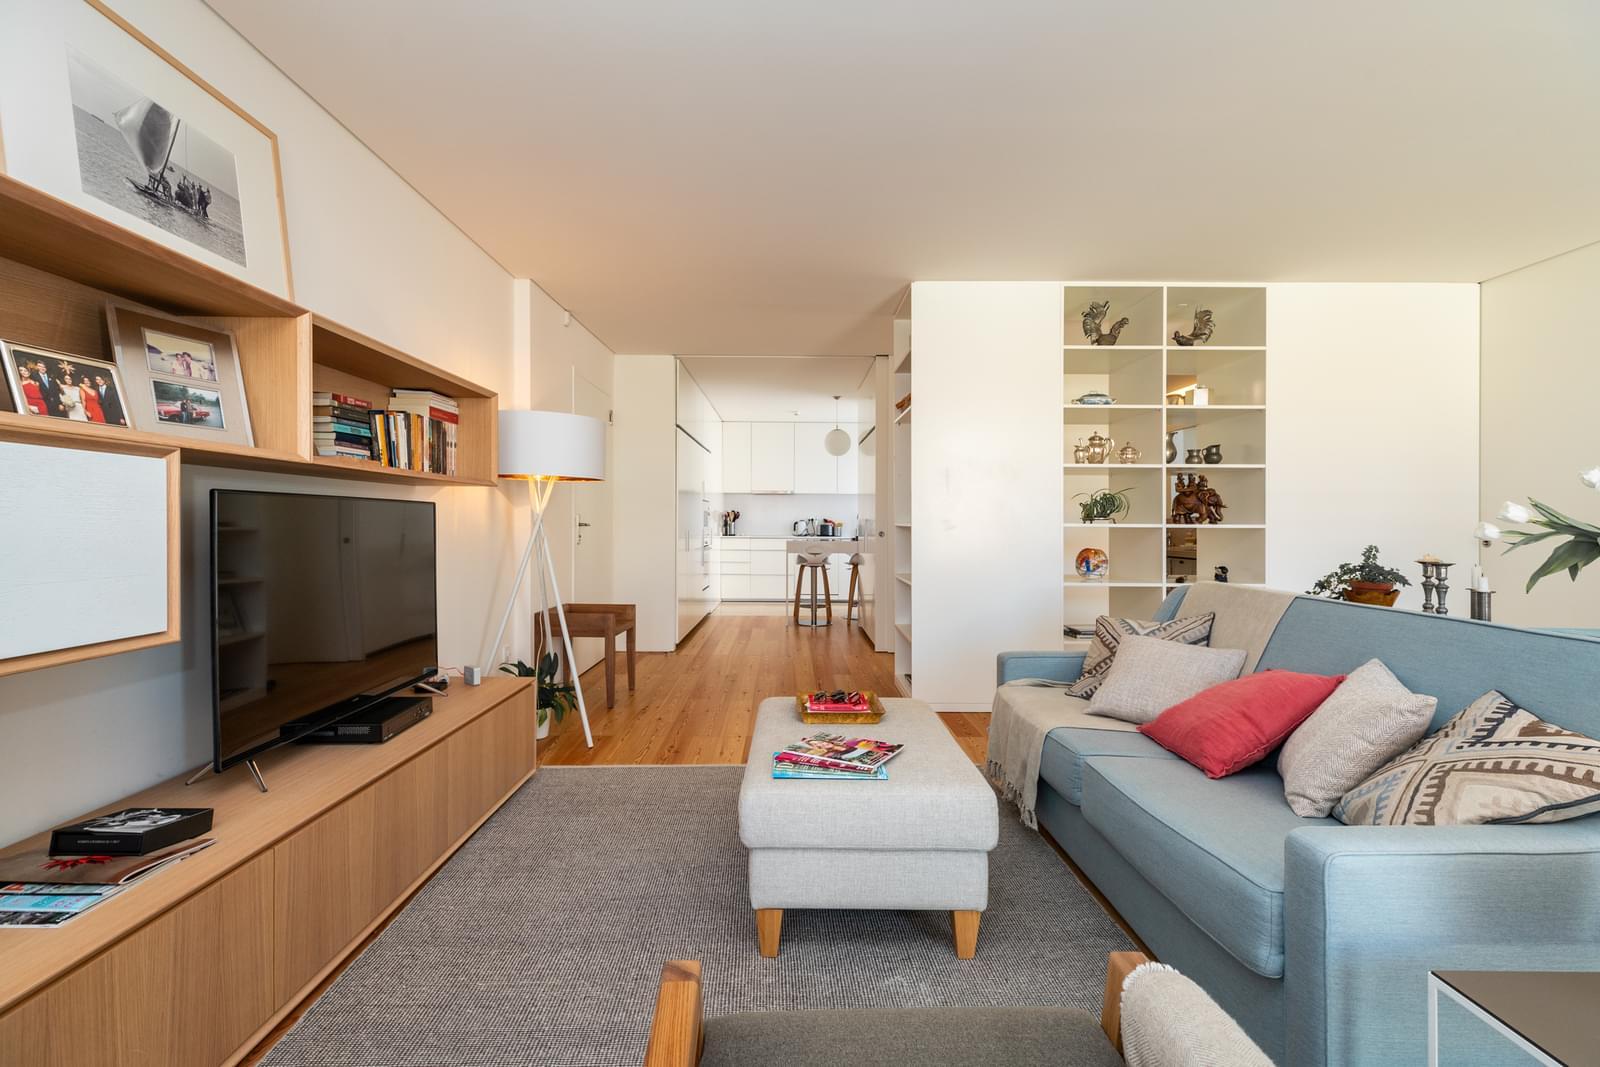 pf19126-apartamento-t2-lisboa-14928723-116a-44f1-9736-80365eb38817